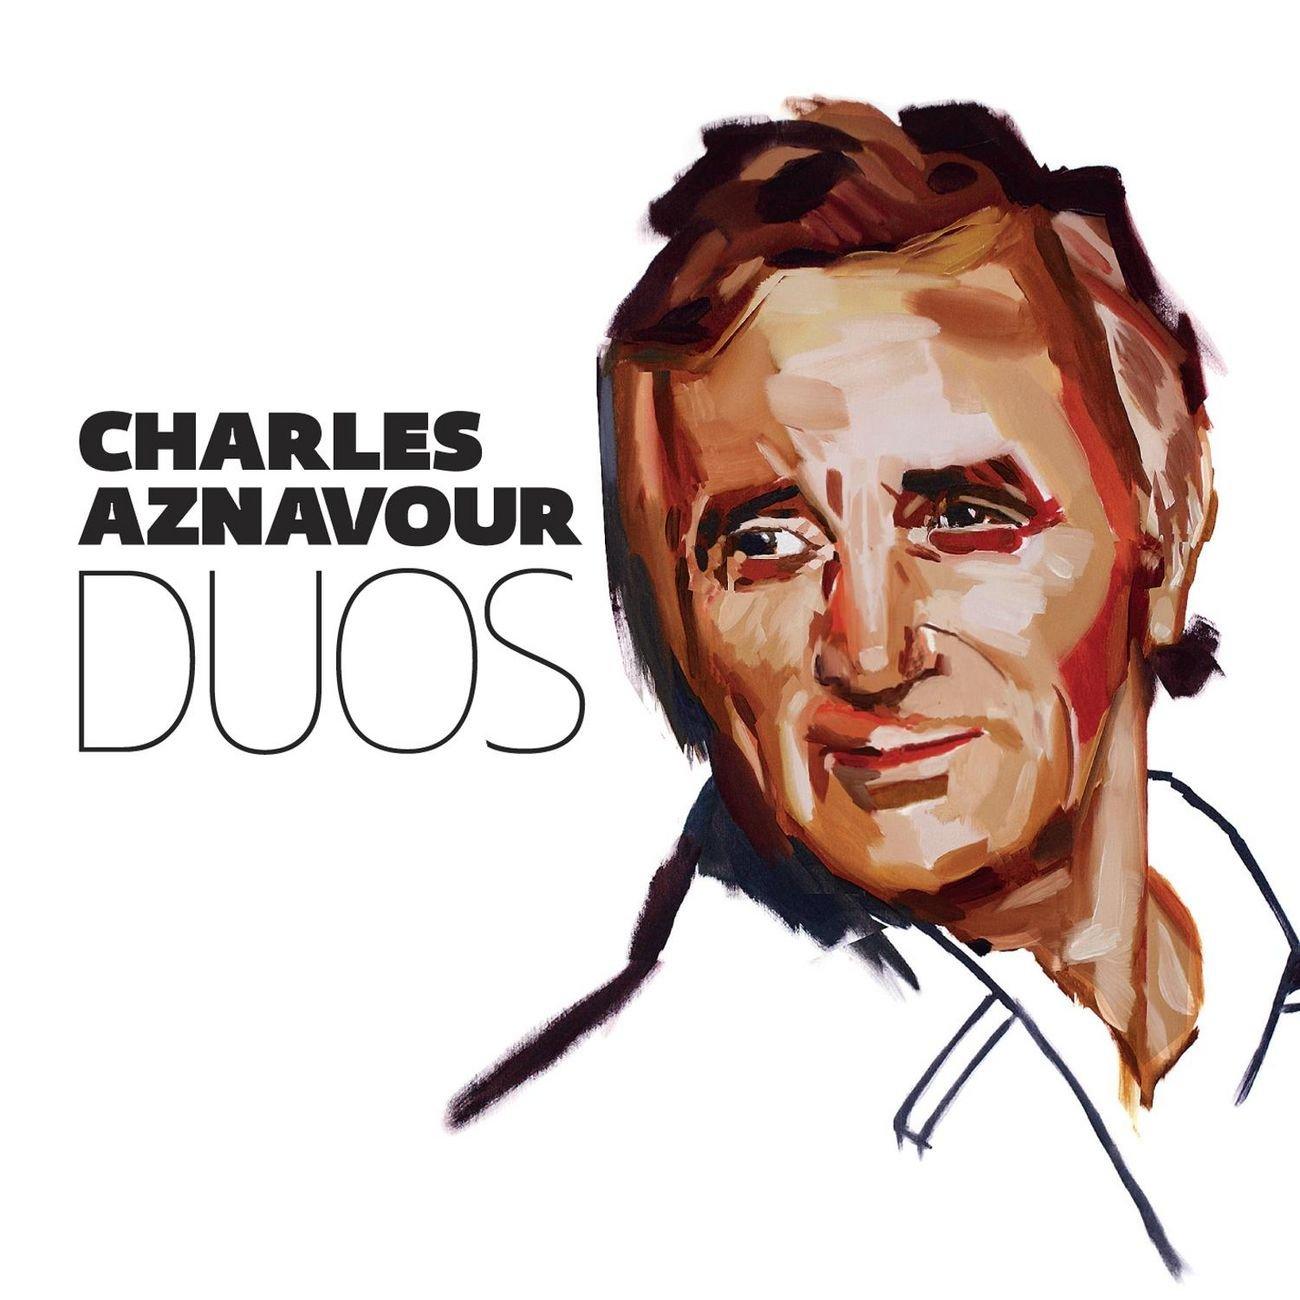 Charles Aznavour couple